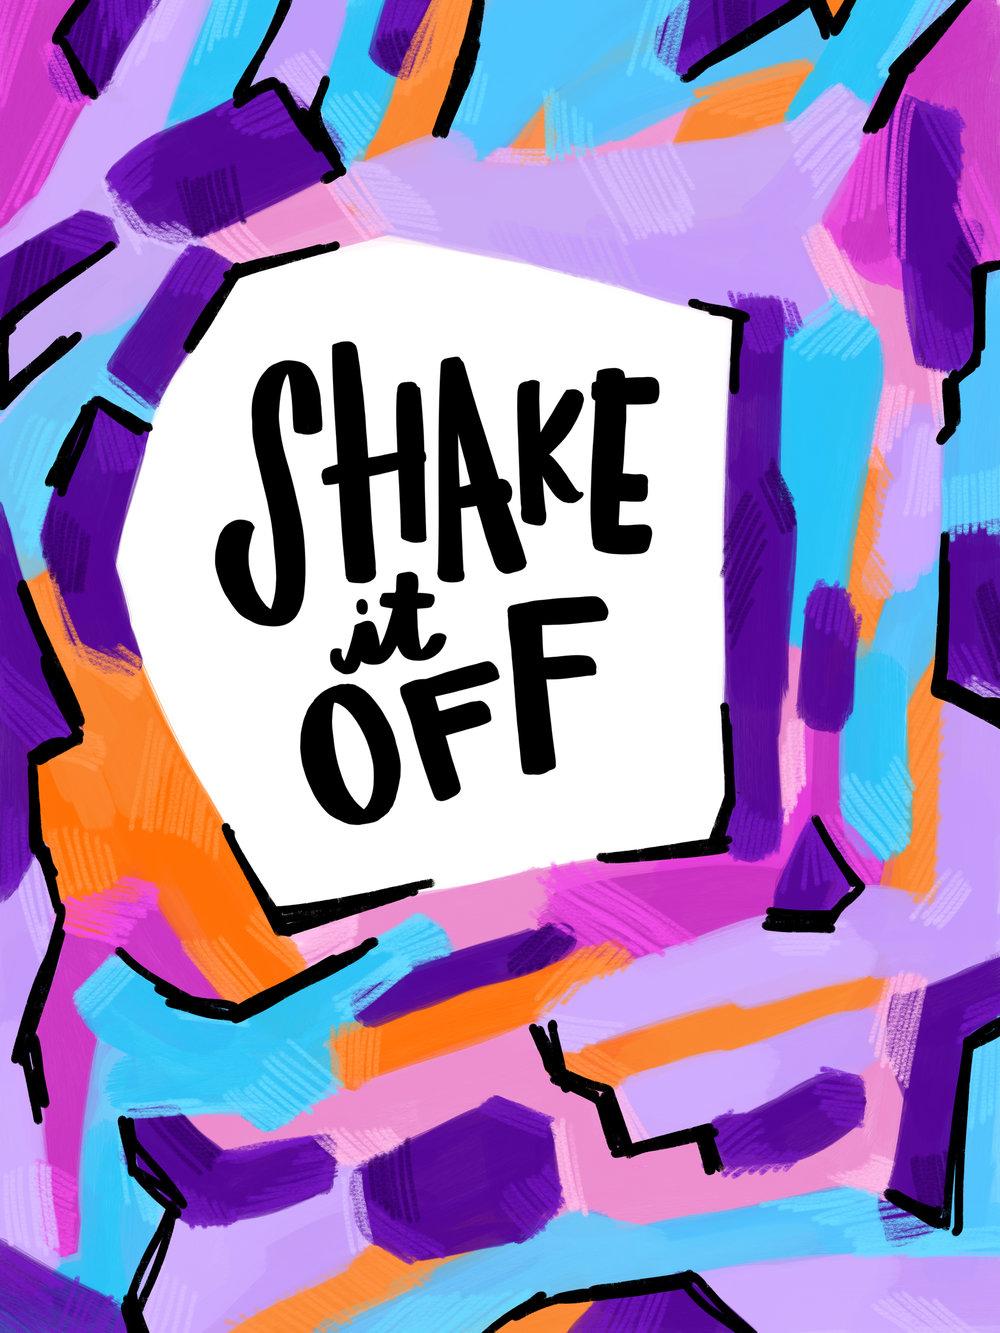 5/13/16: Shake